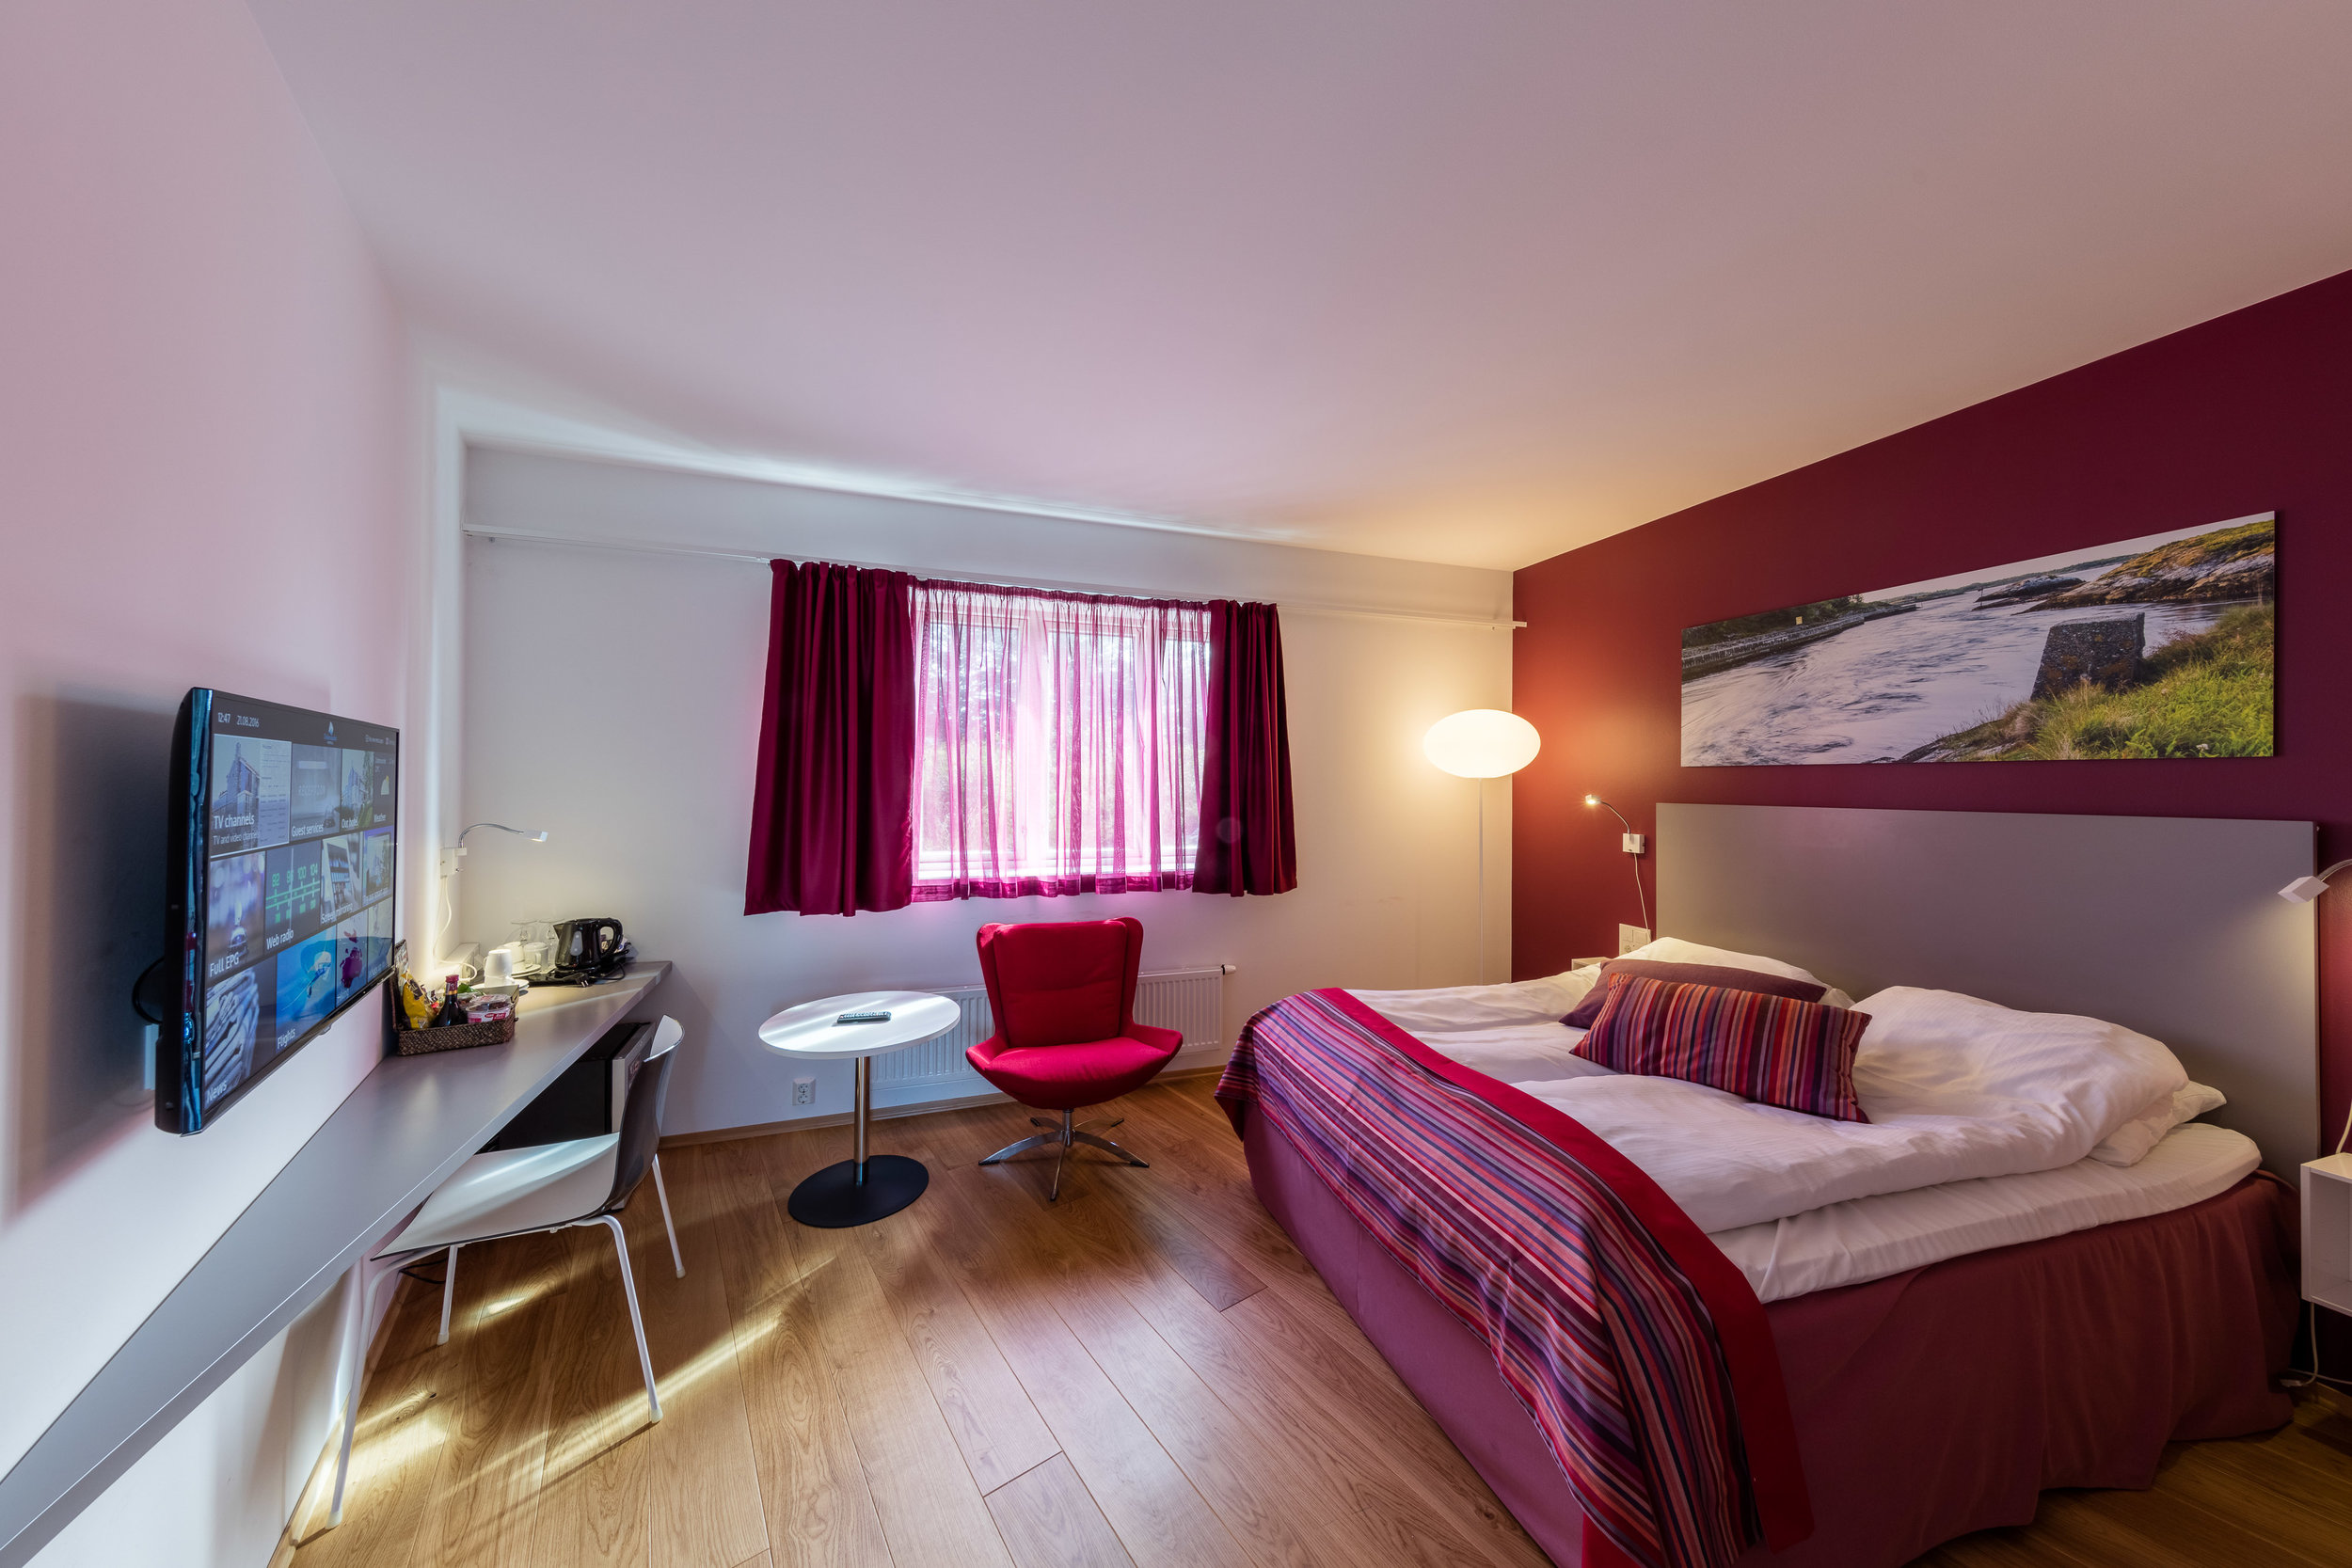 Dolmsundet-hotell-Hitra-norway-fotoknoff-sven-erik-knoff--40.jpg